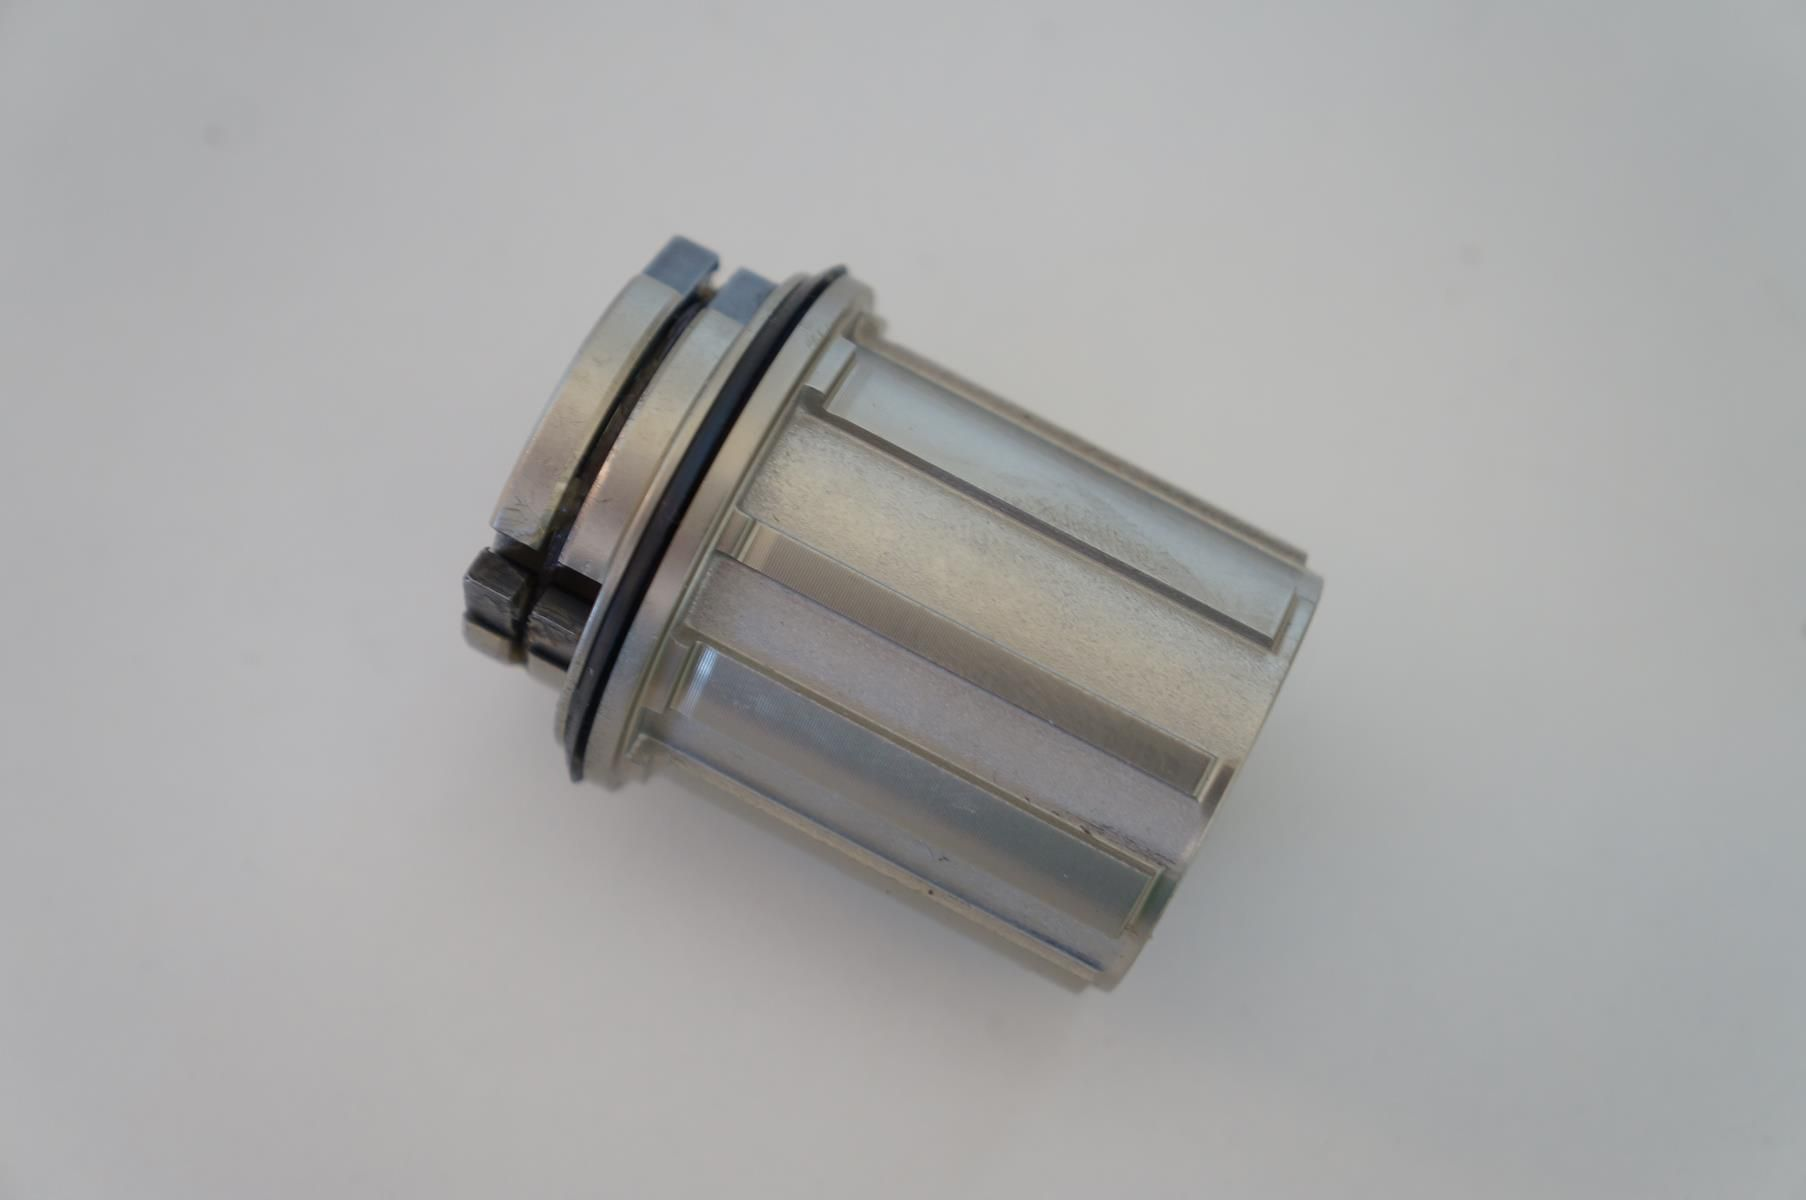 Freehub Cubo Vicinitech XM1700 1550 para Cassetes Shimano 10 velocidades